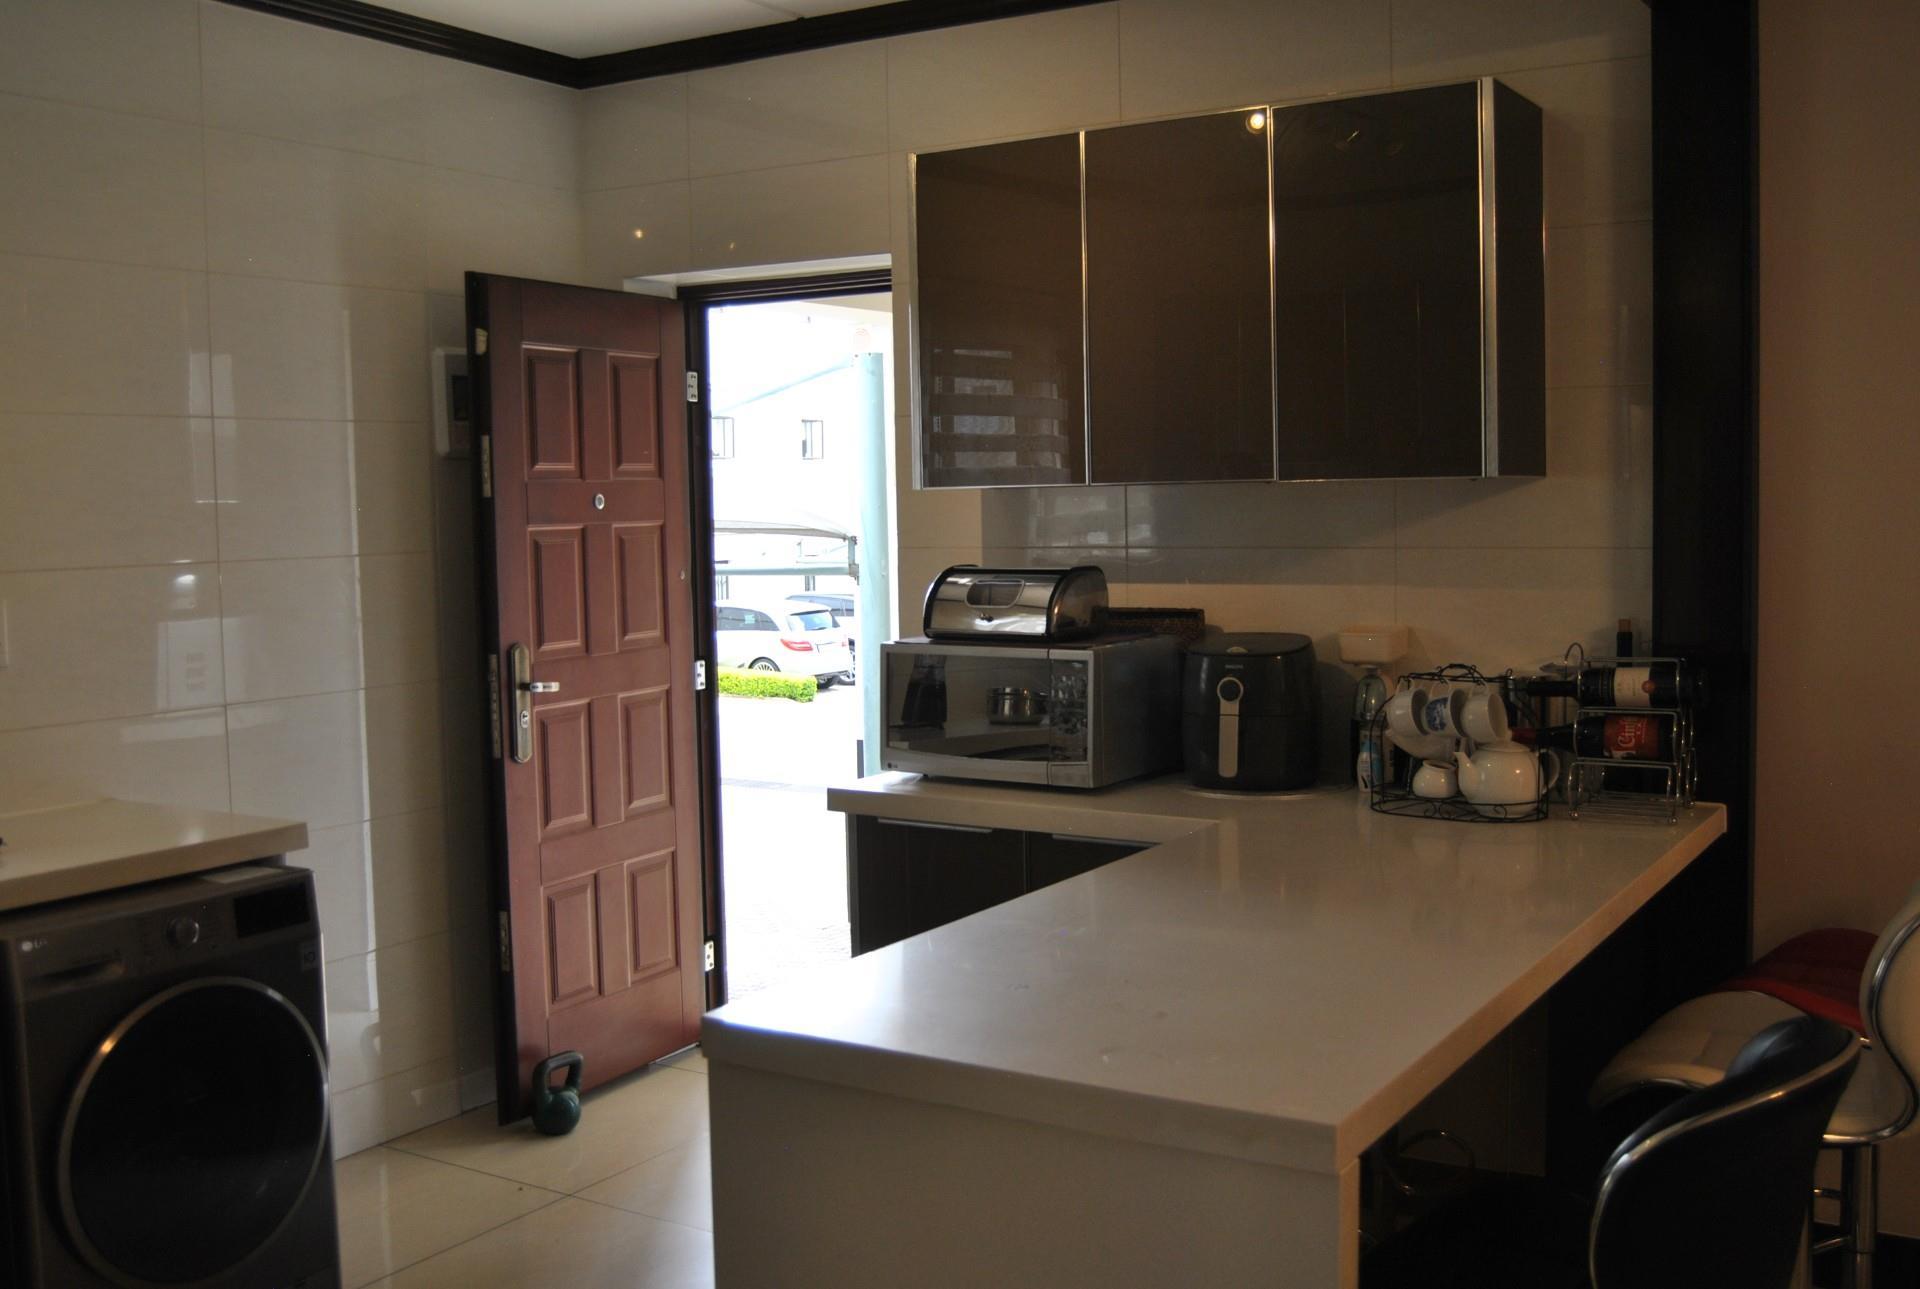 3 Bedroom House To Rent in Craigavon